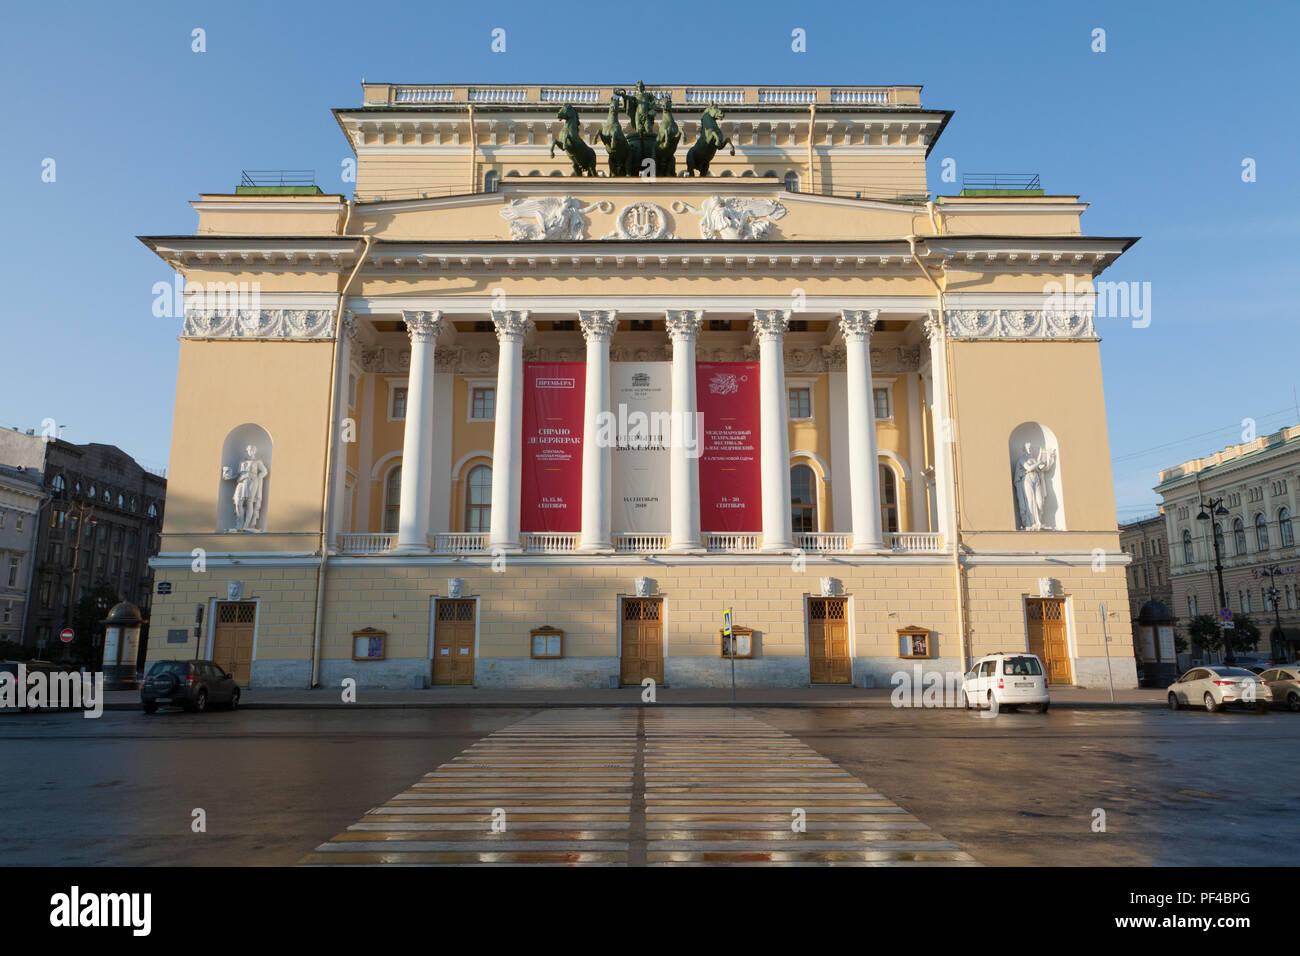 Alexandrinsky Theatre (Russian State Pushkin Academy Drama Theater) in Saint Petersburg, Russia. - Stock Image